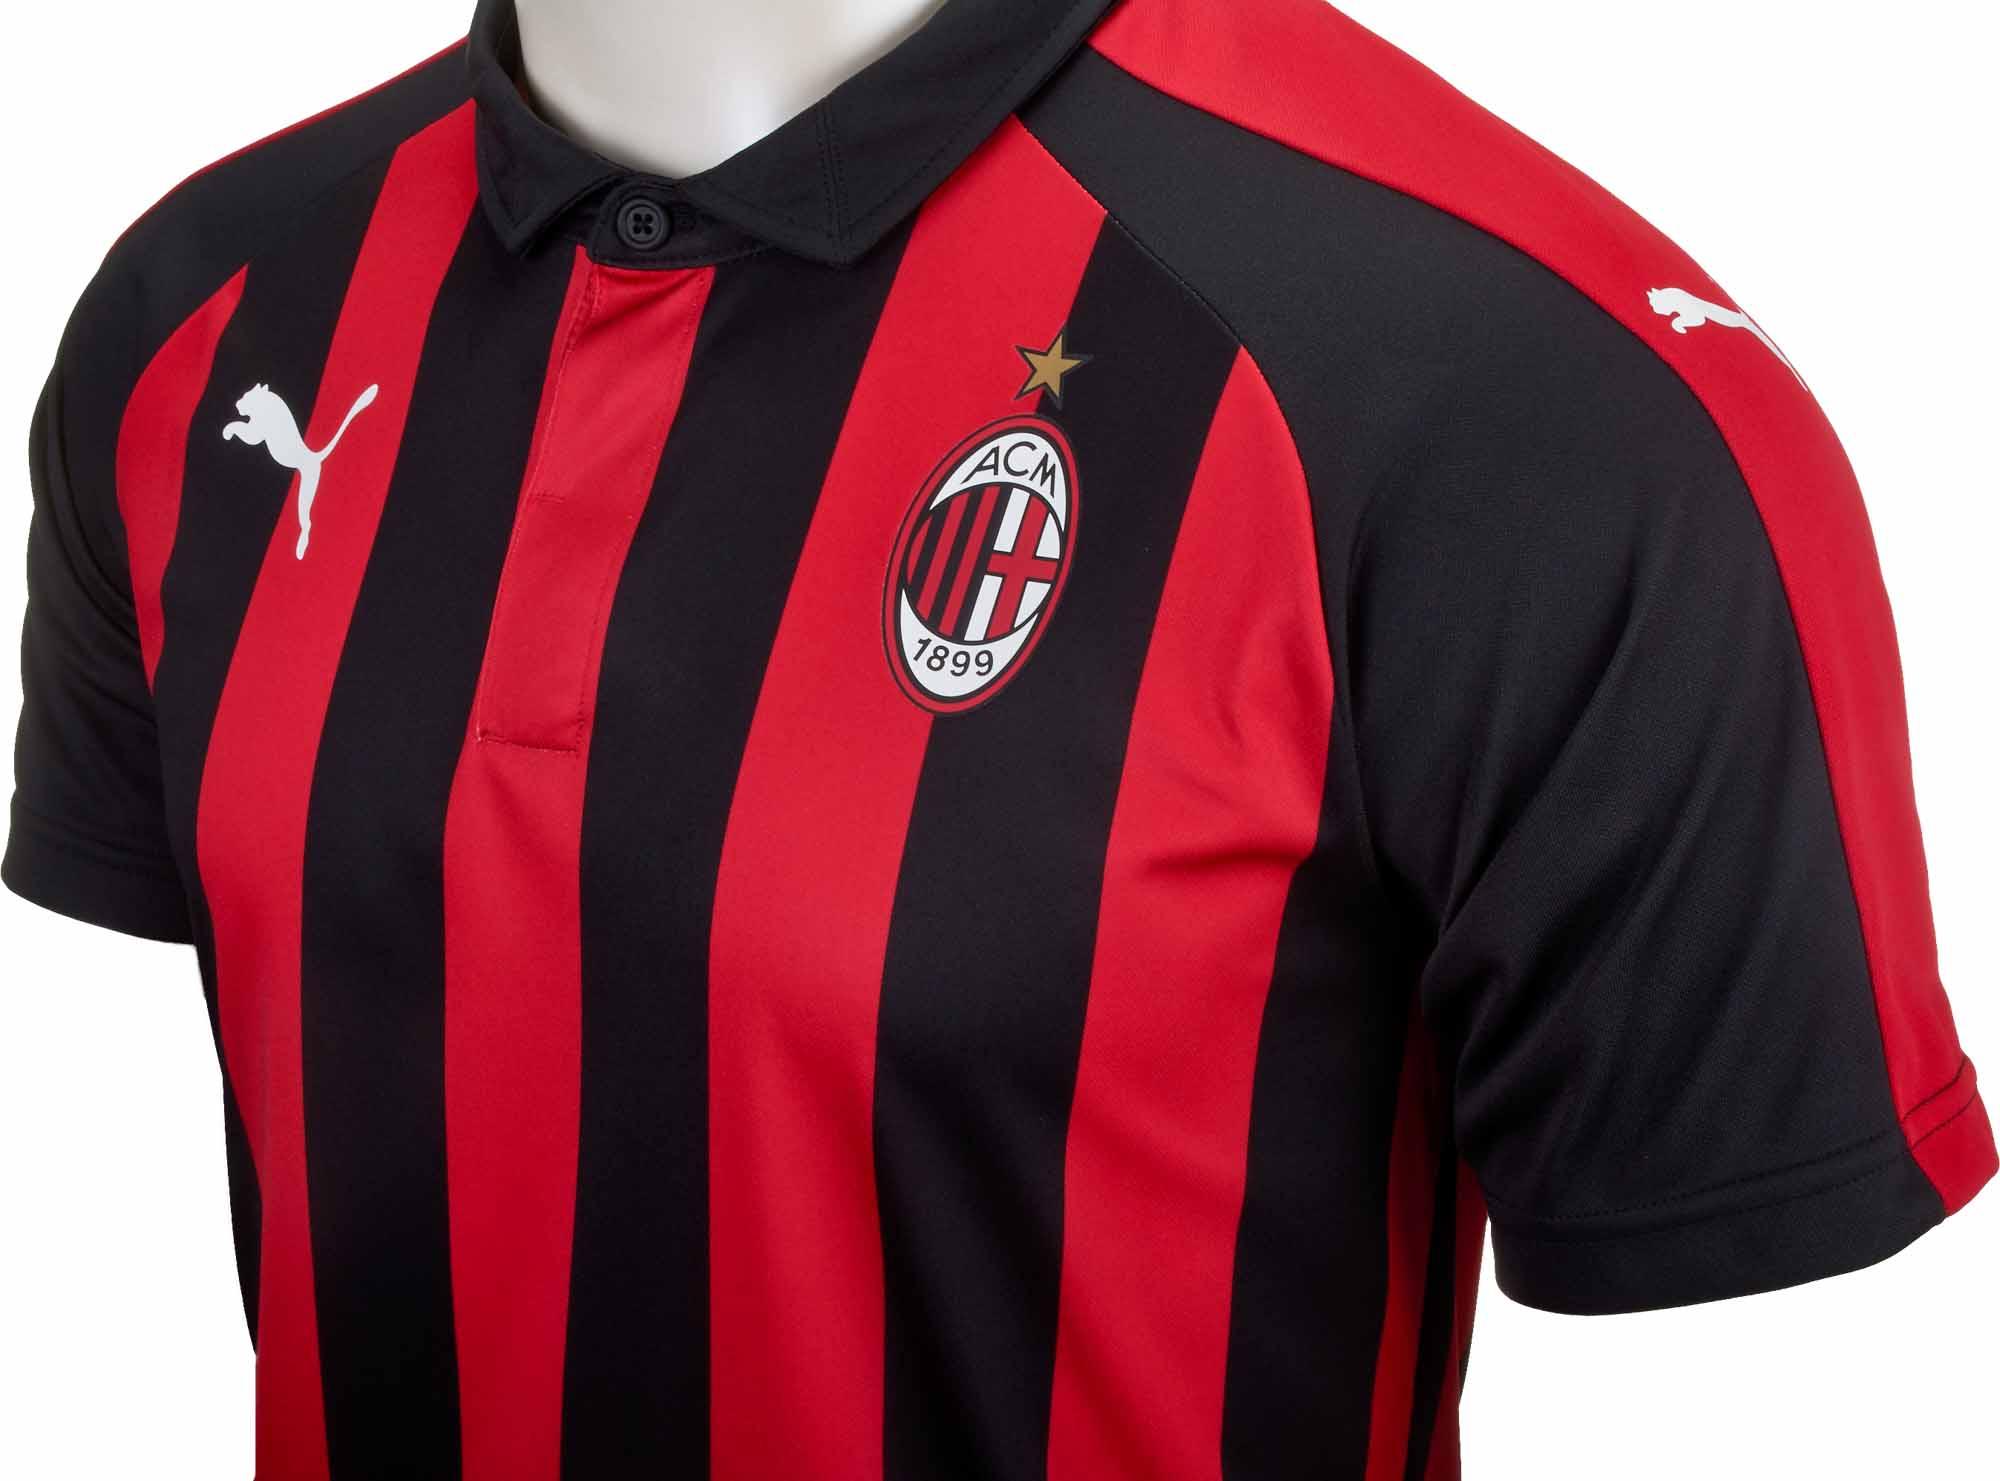 new styles e75aa 40f86 PUMA AC Milan Home Jersey - Special Edition - Chili Pepper/Black - SoccerPro